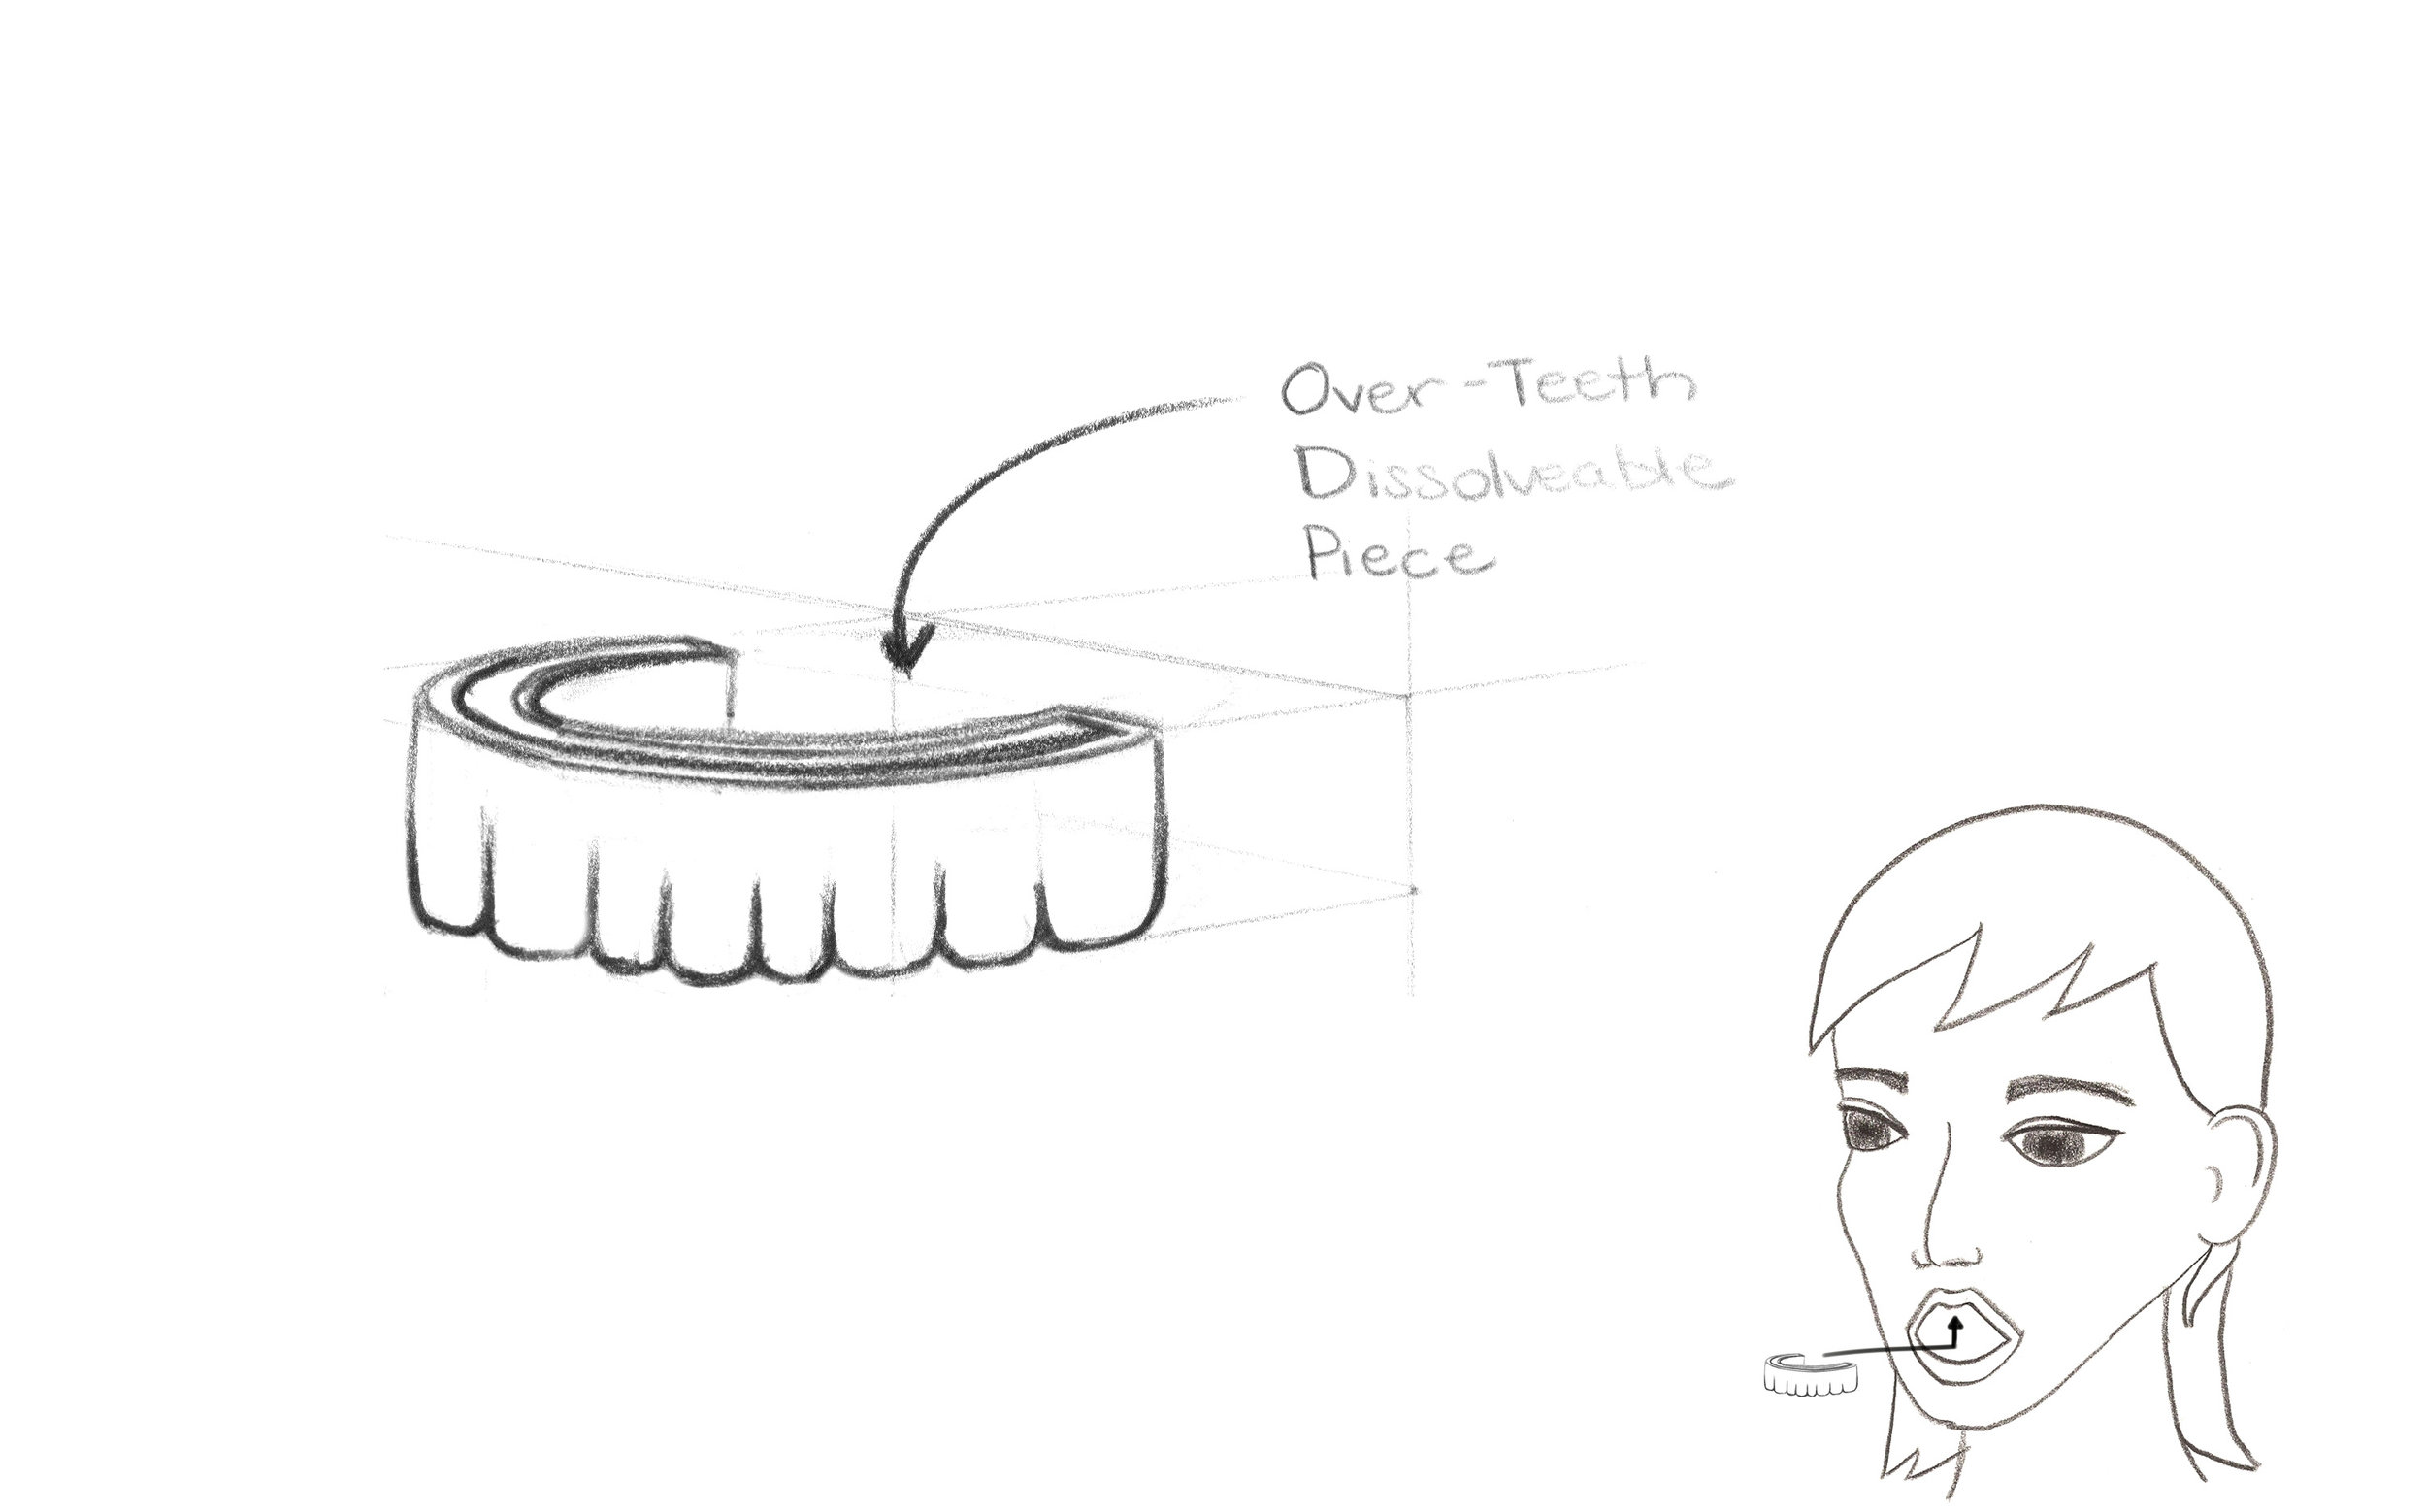 Augmented Taste Concept: 3D-Printed Dissolving Teeth Piece